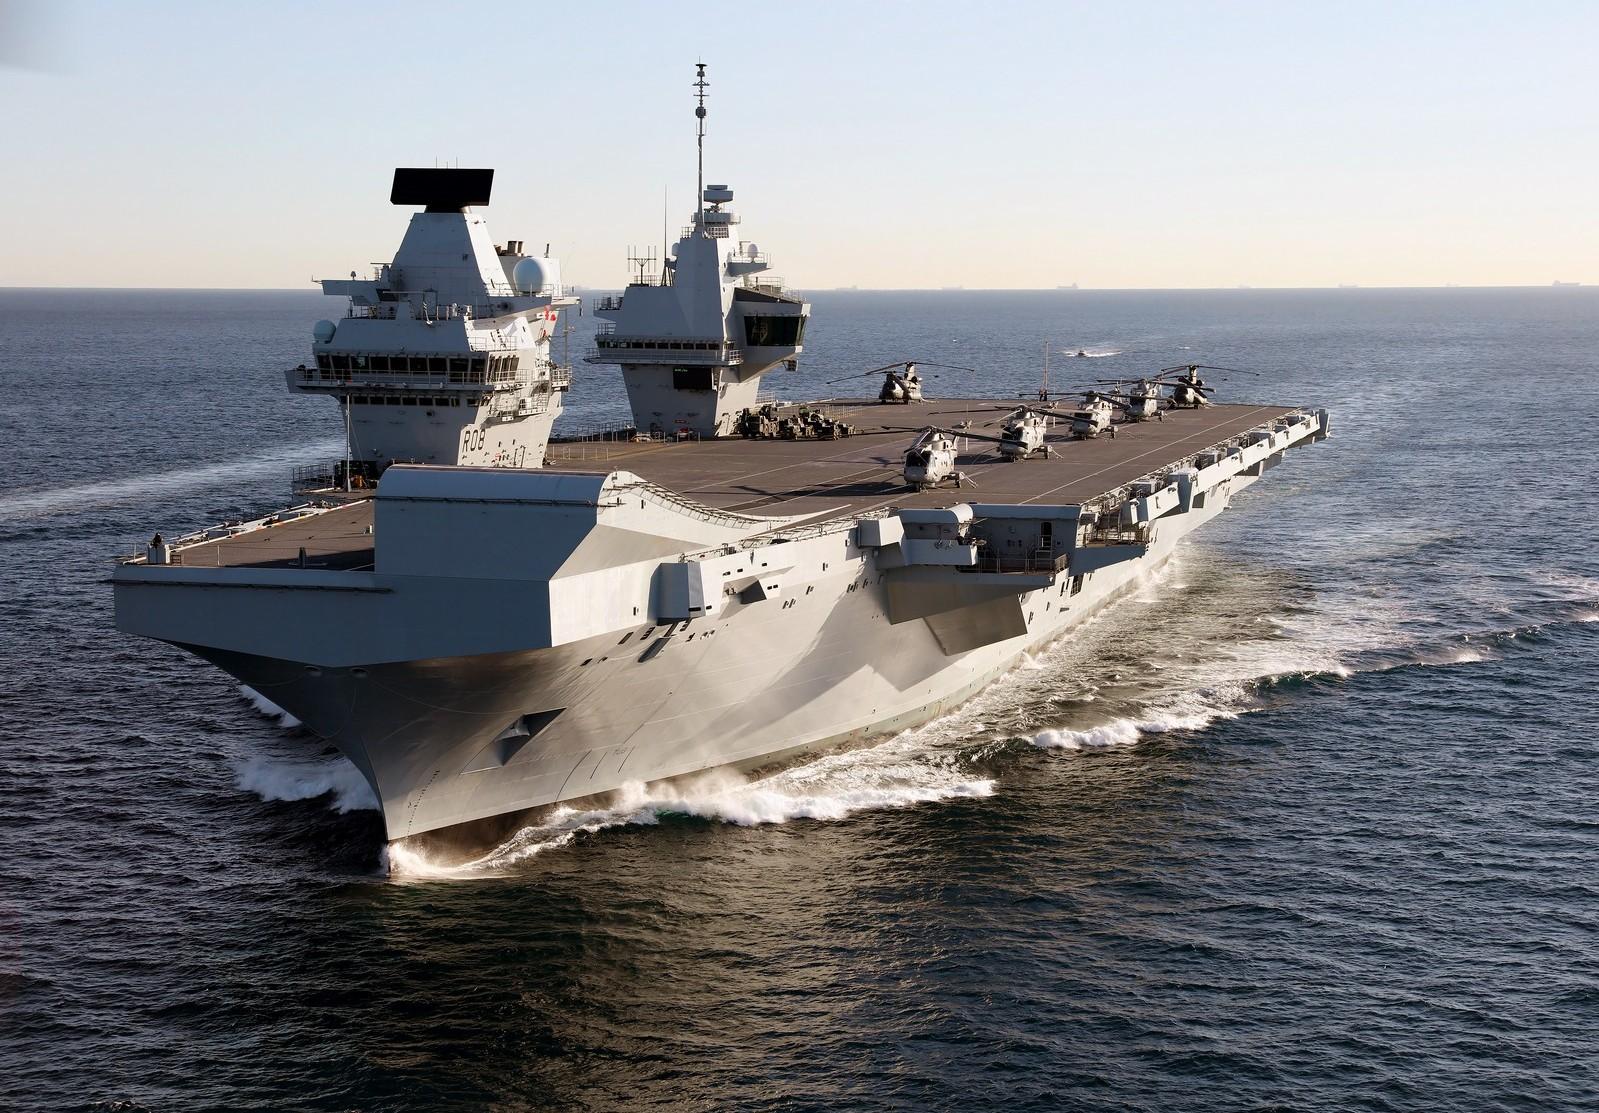 HMS Queen Elizabeth becomes fleet flagship of Royal Navy